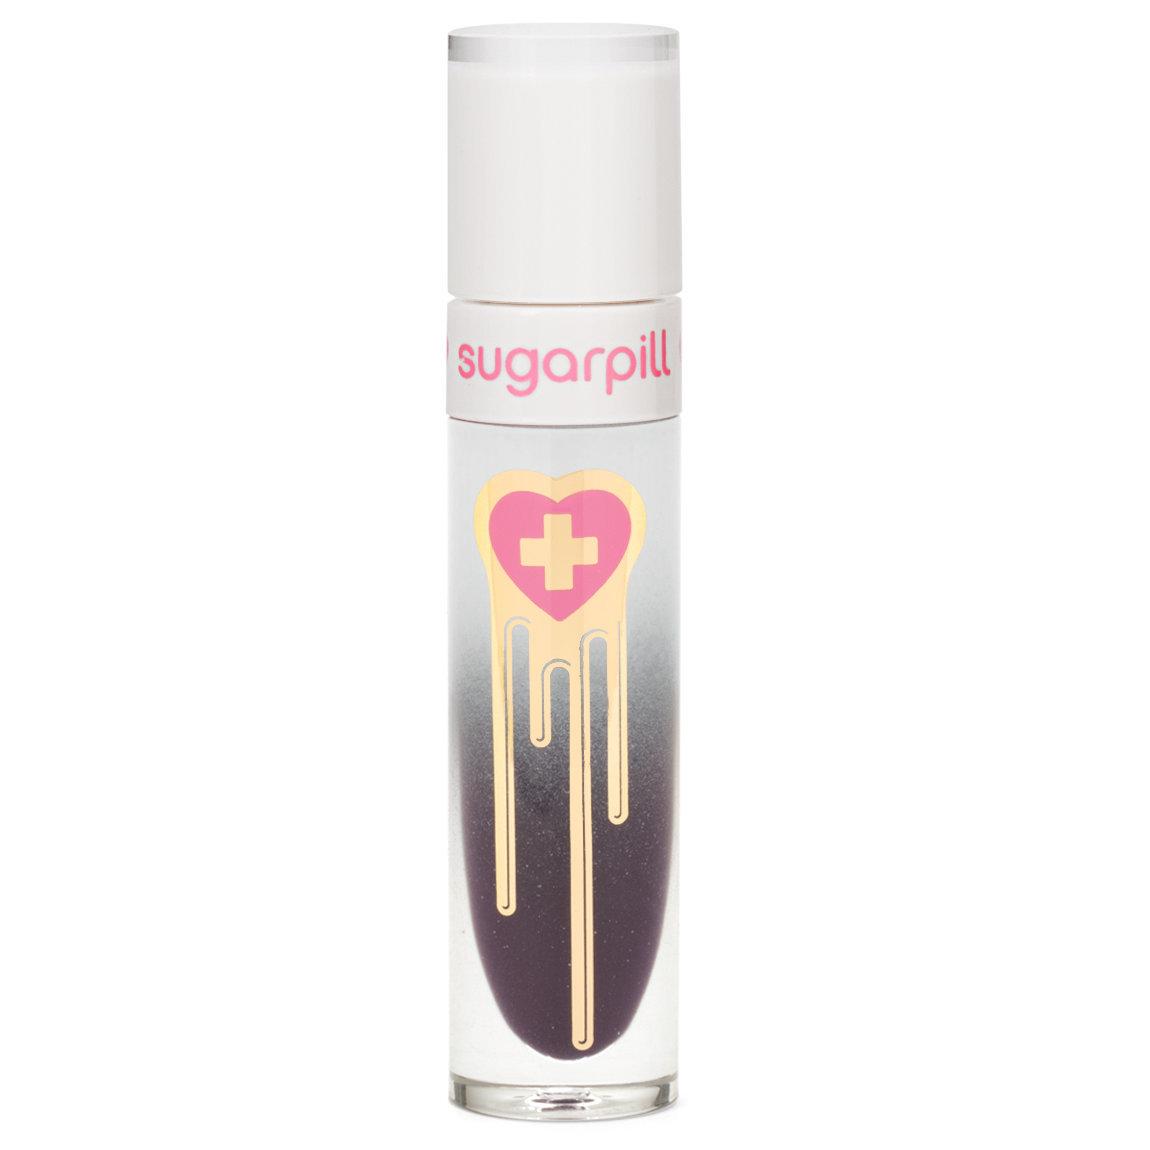 Sugarpill Cosmetics Liquid Lip Color Dark Sided